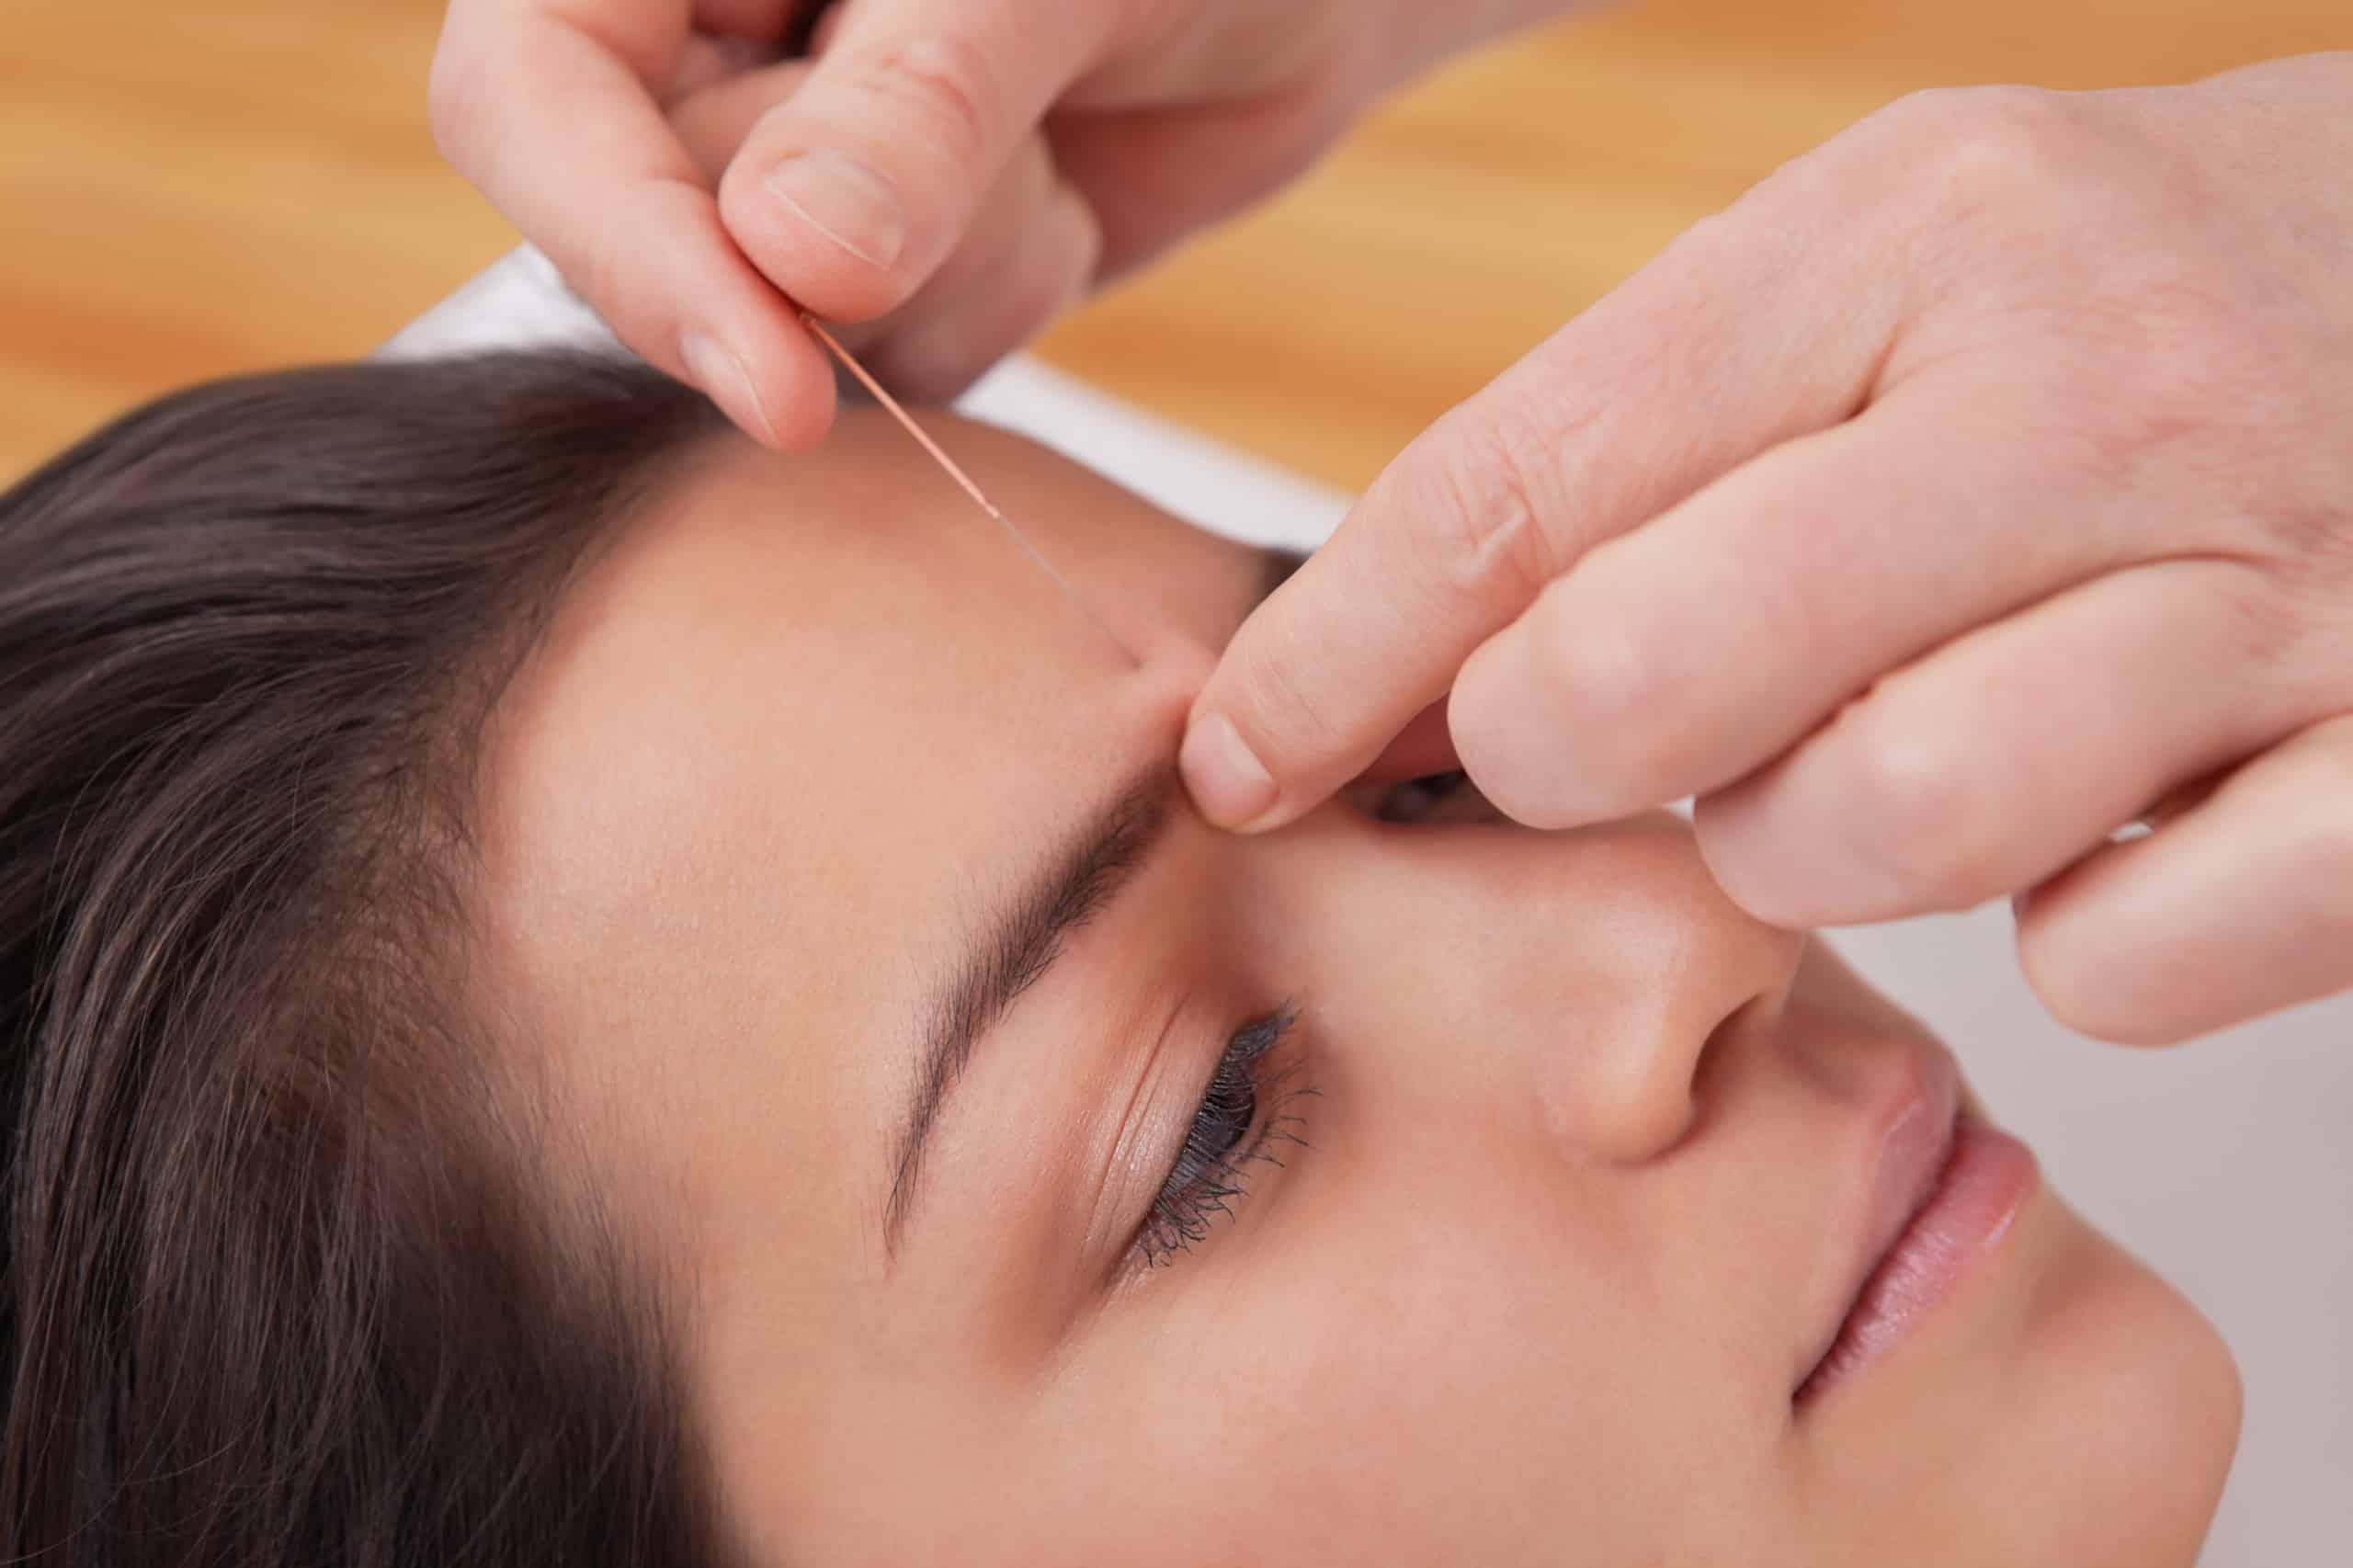 Acupuncture Richmond VA, acupuncture for scars